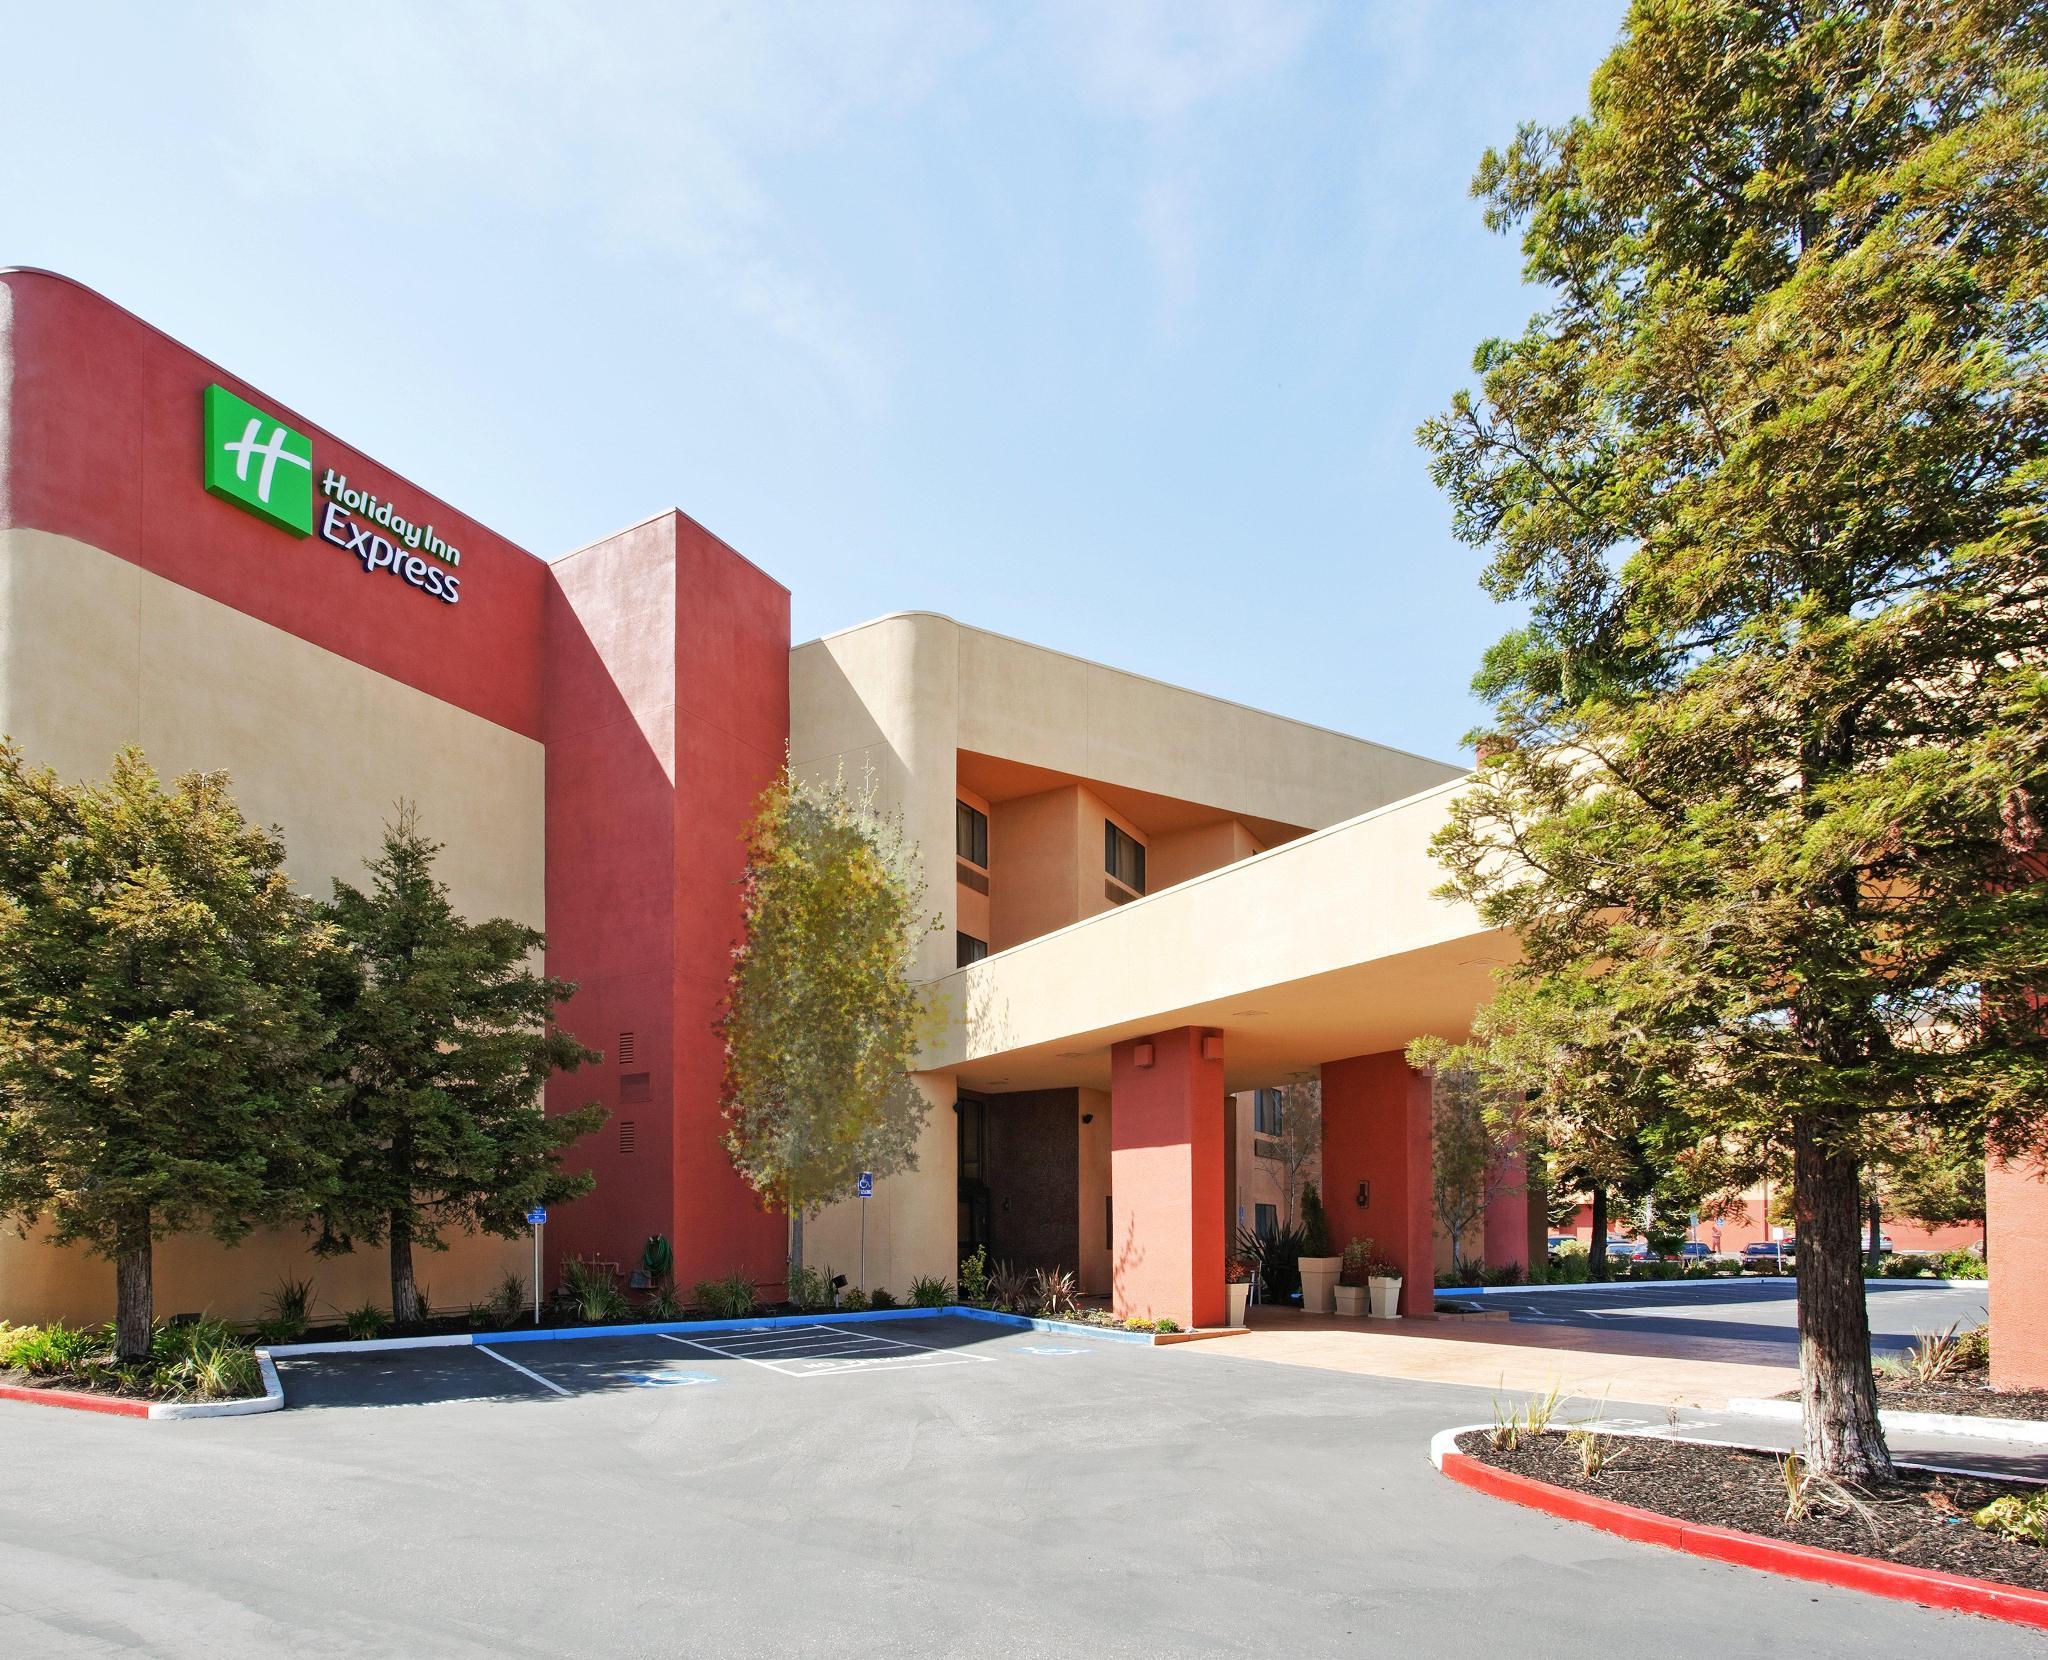 Holiday Inn Express Union City